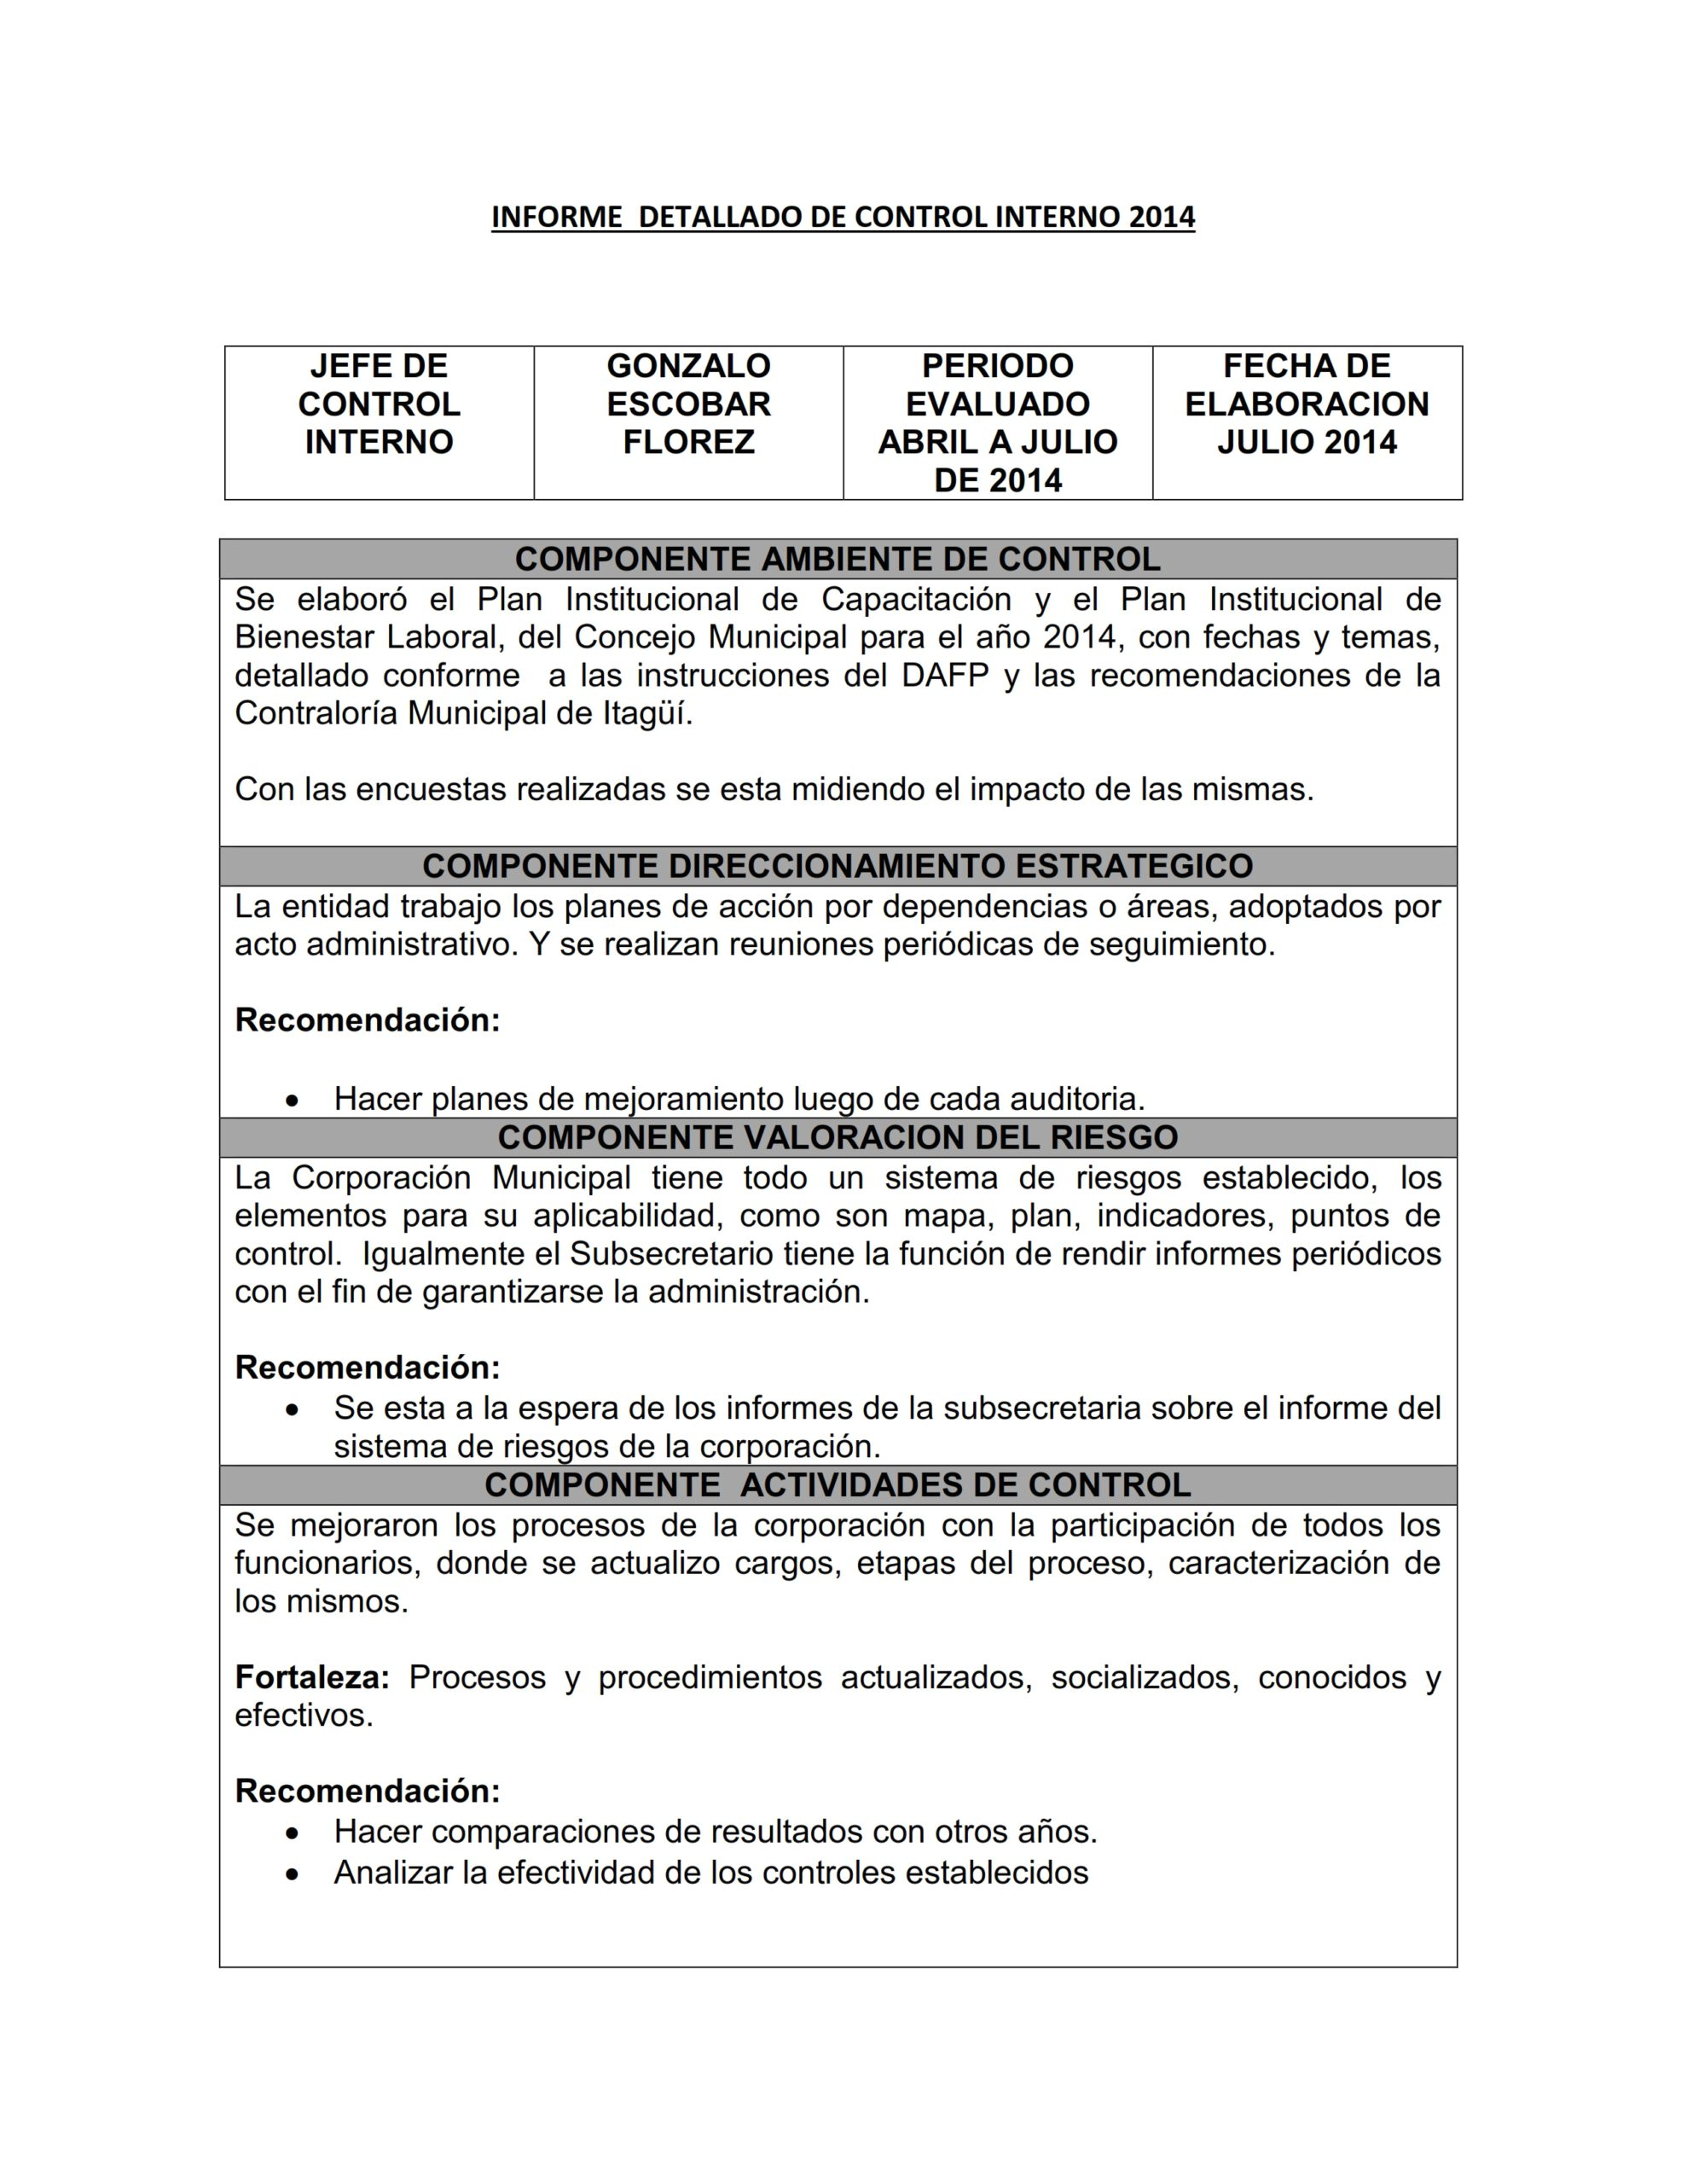 https://concejodeitagui.gov.co/wp-content/uploads/2020/11/2014_segundoinforme1-scaled.jpg